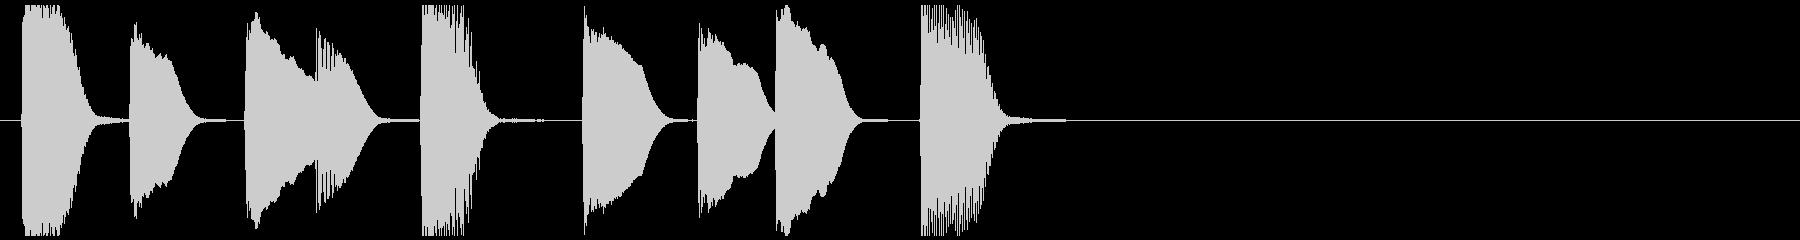 CM、フレーズ系ピアノジングルの未再生の波形